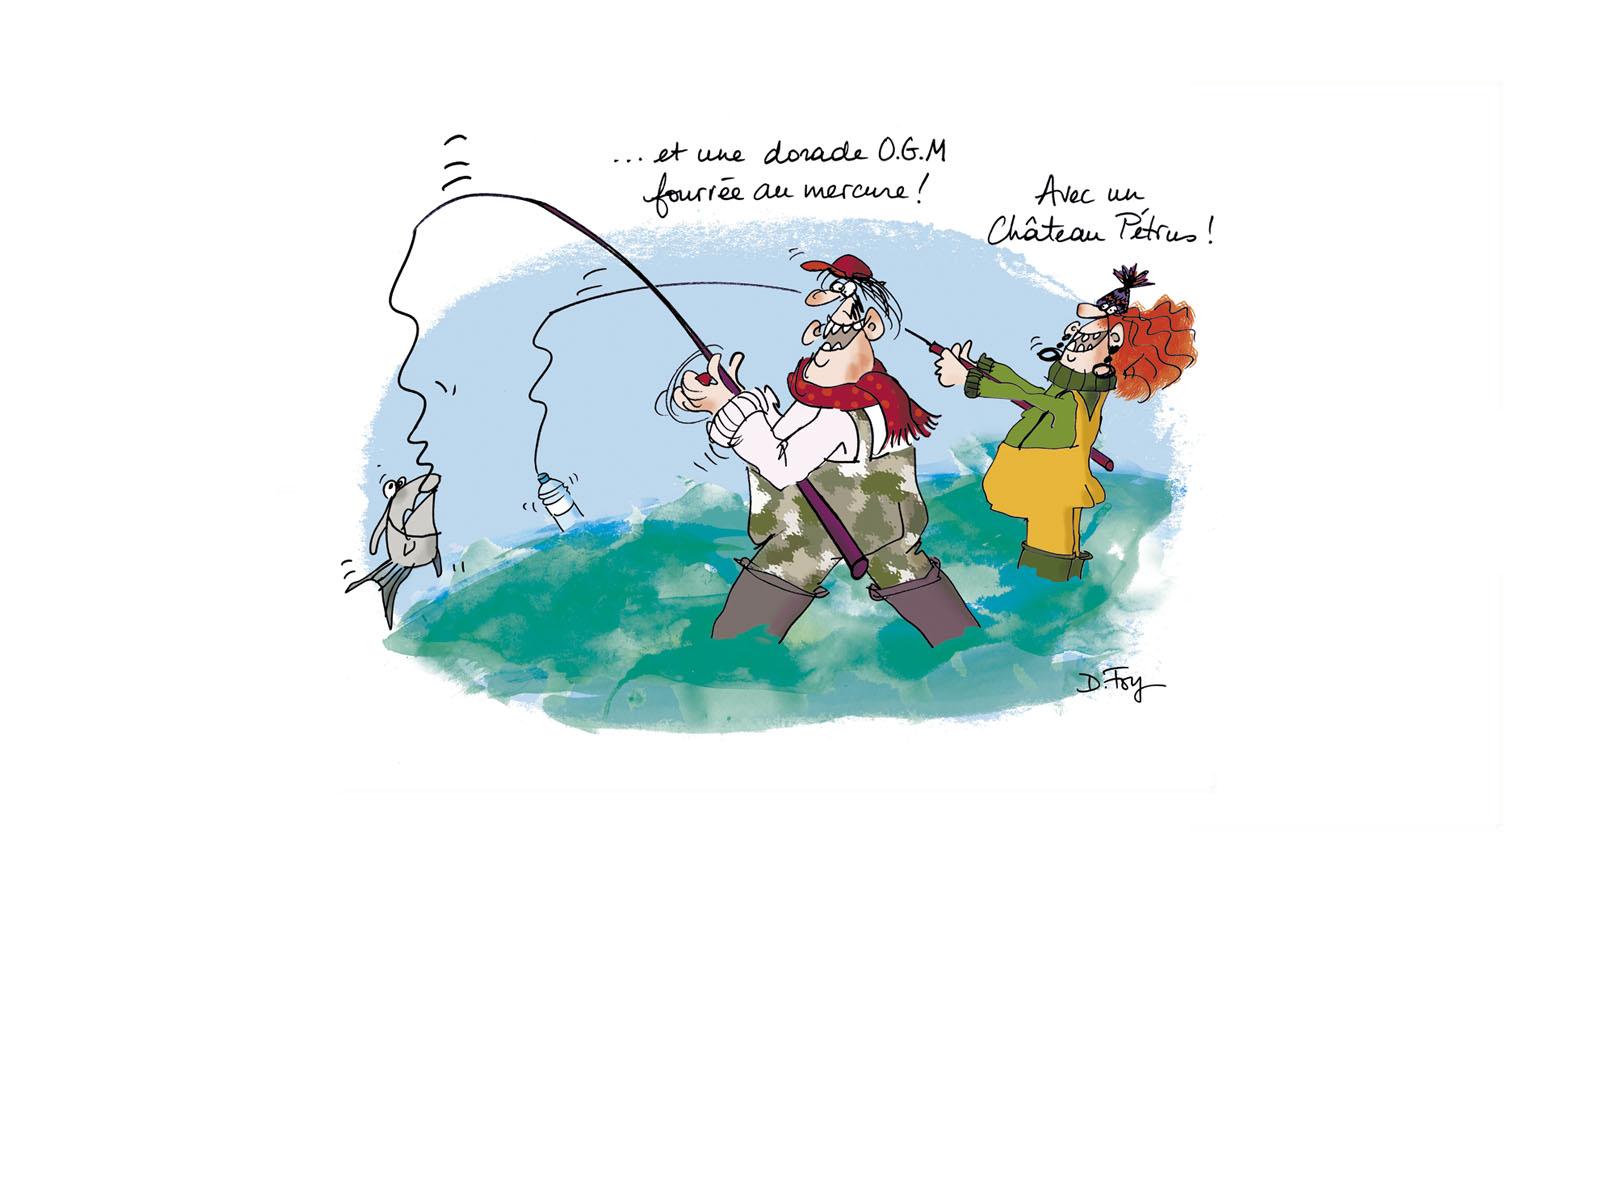 FOYDominique-Illustrations-3765